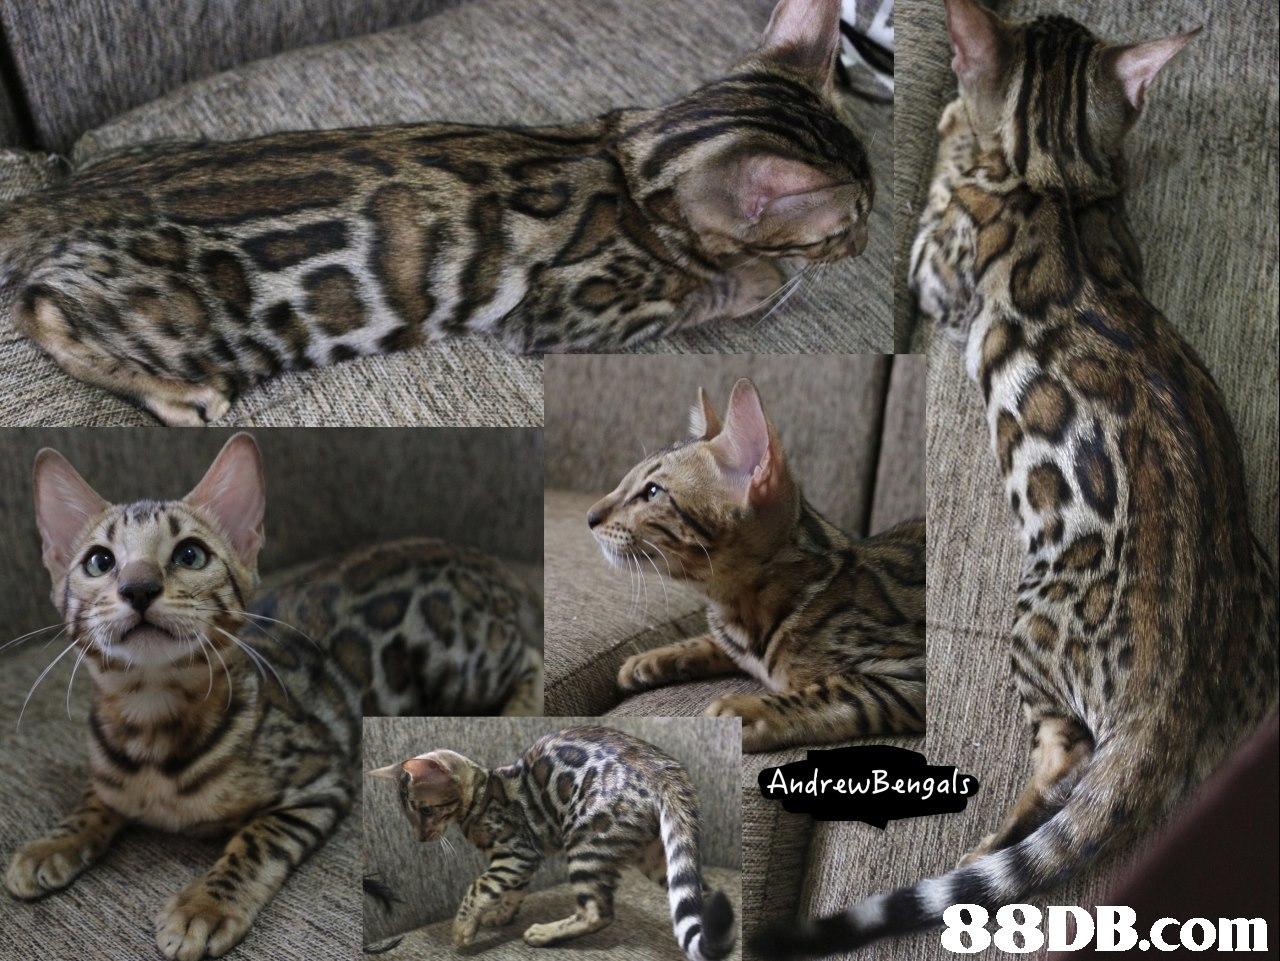 AndrewBengals,cat,mammal,small to medium sized cats,cat like mammal,dragon li